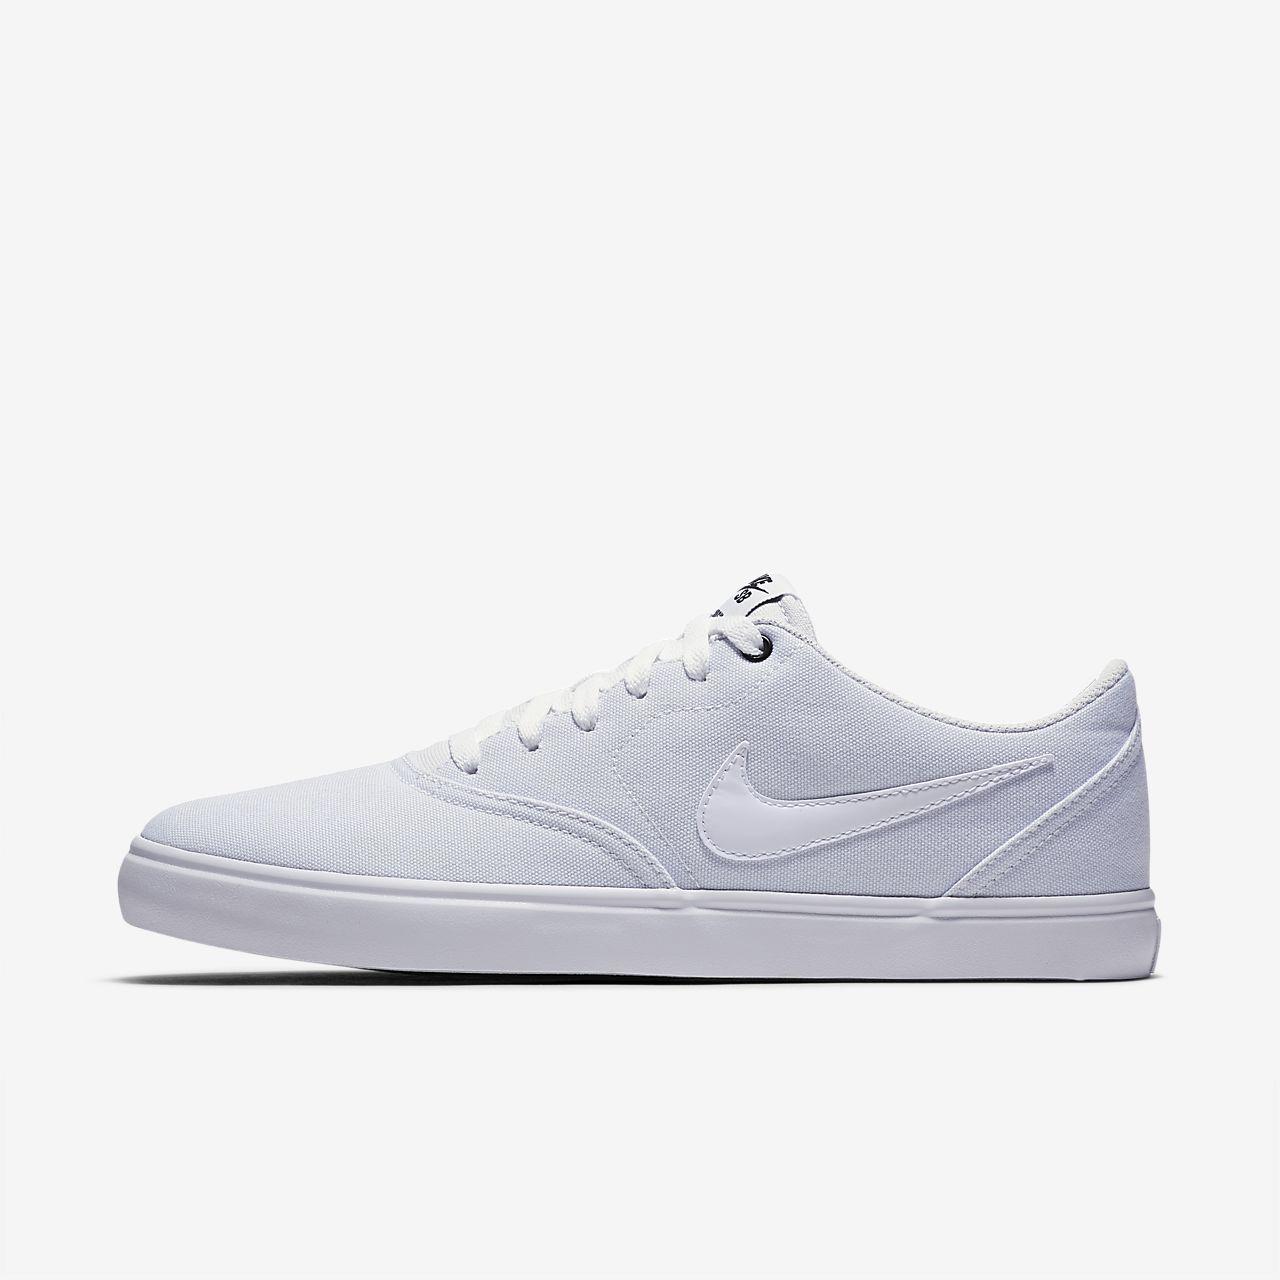 Nike SB Check Solarsoft Canvas Herren-Skateboardschuh